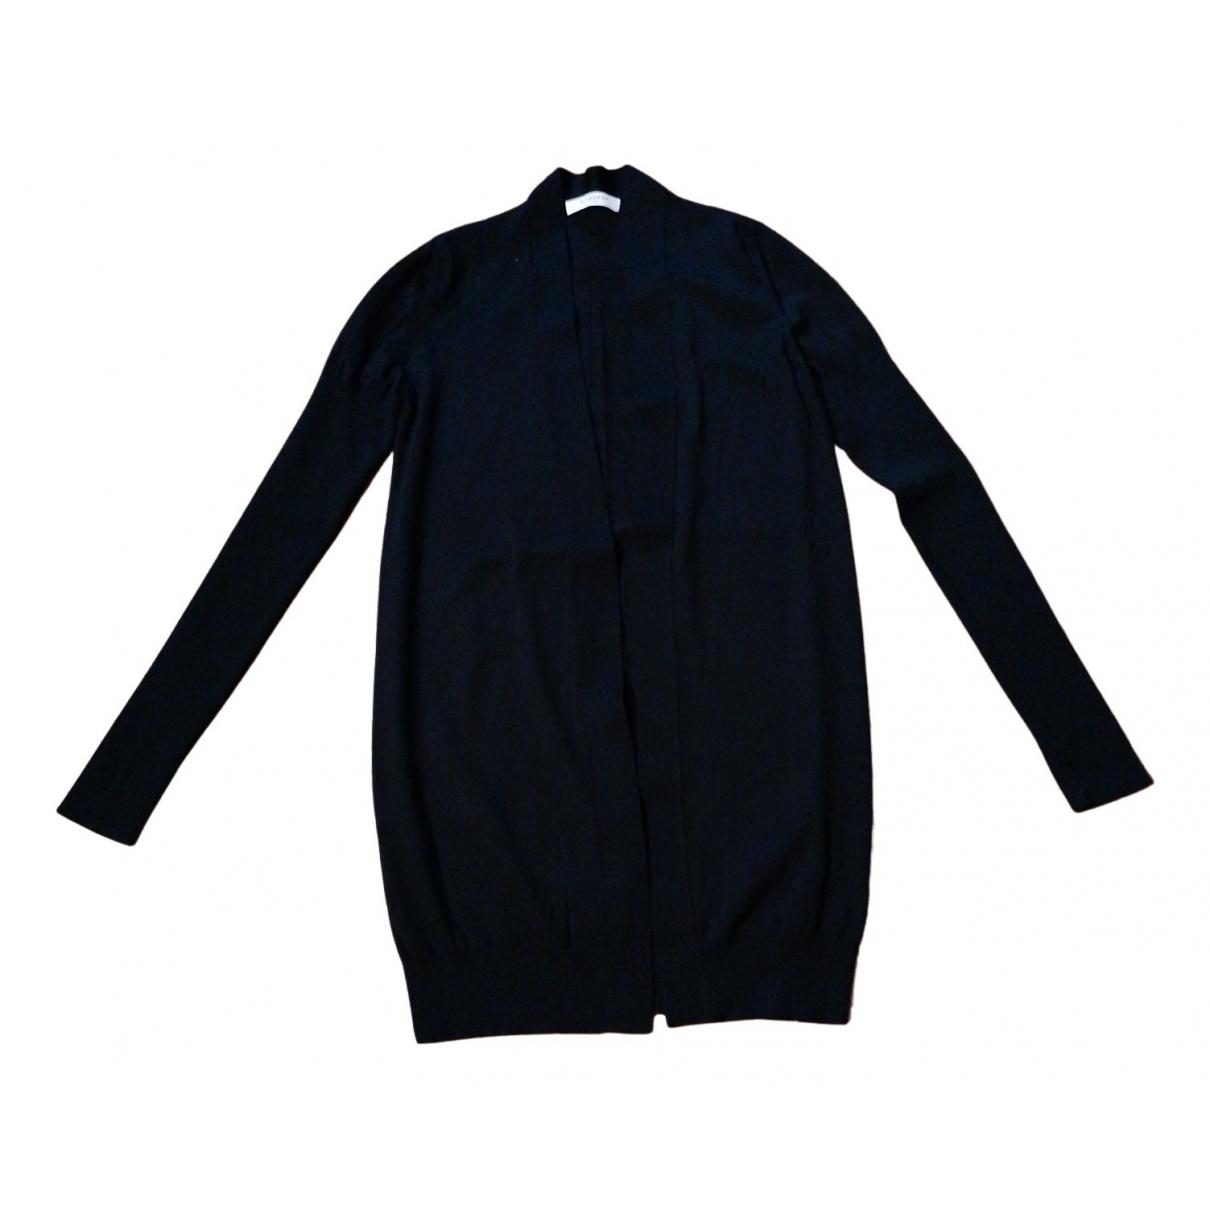 Givenchy N Black Wool Knitwear for Women XS International